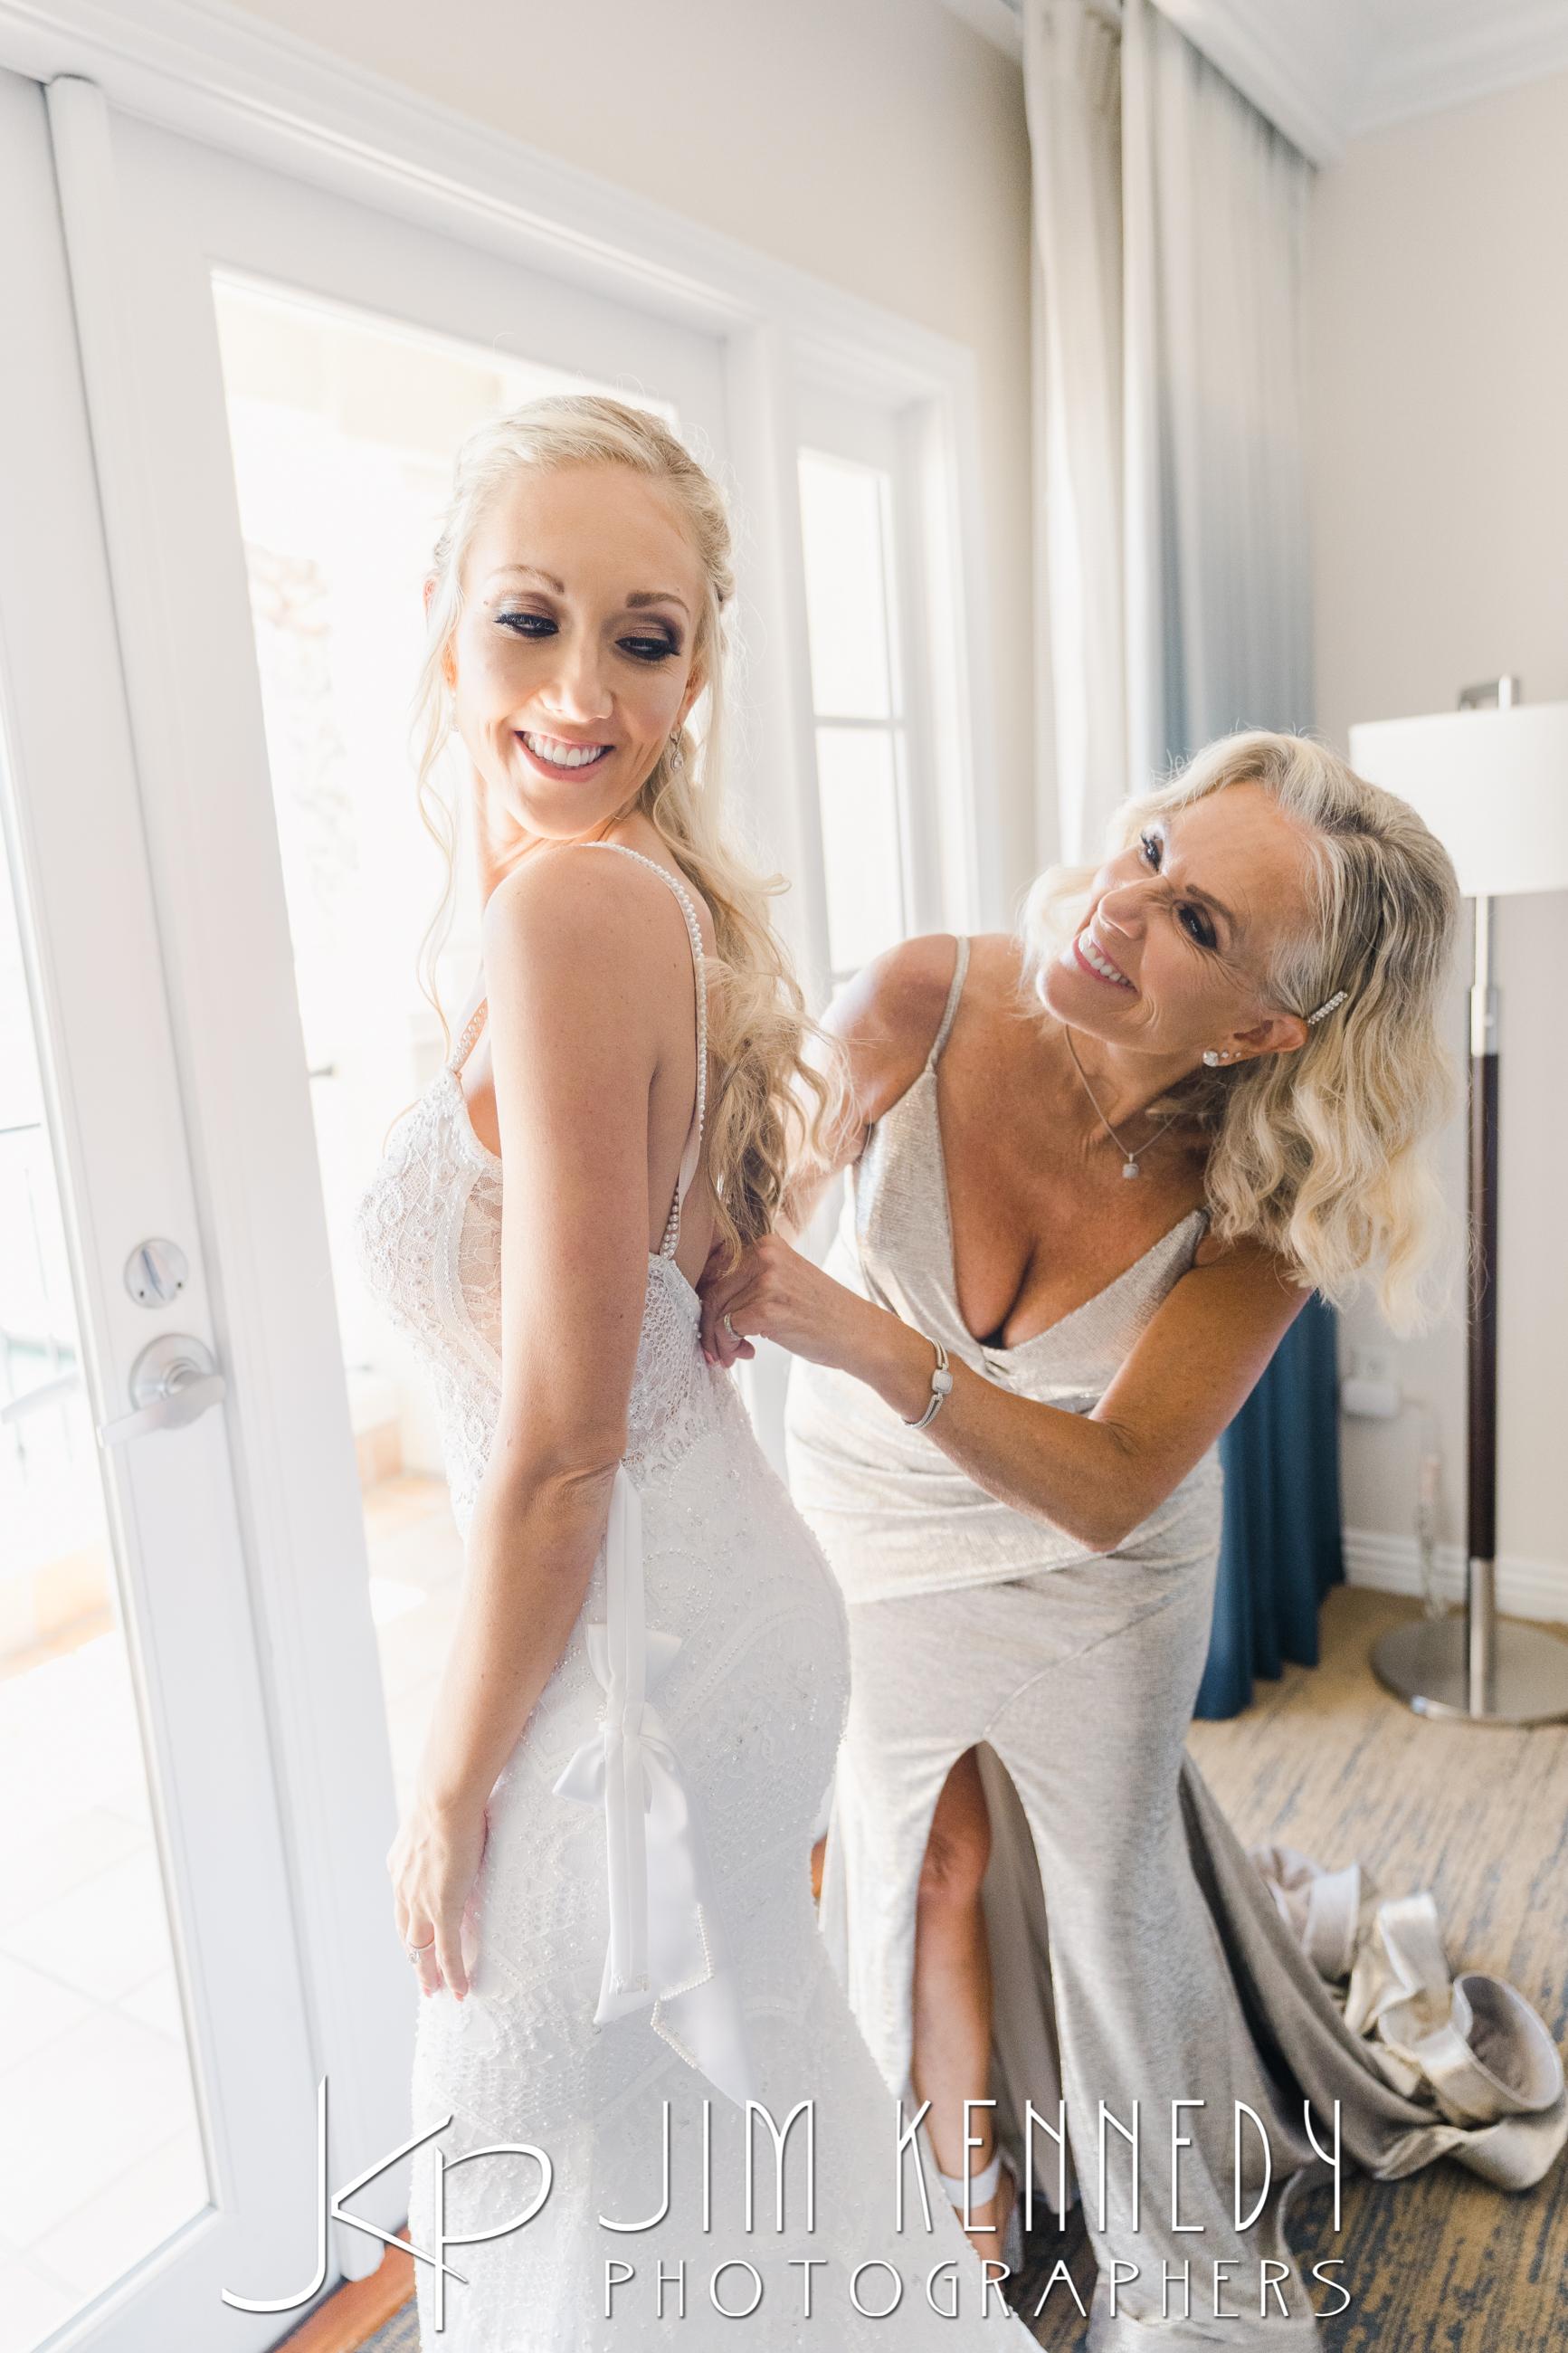 balboa-bay-resort-wedding-brooke-kevin_0021.JPG